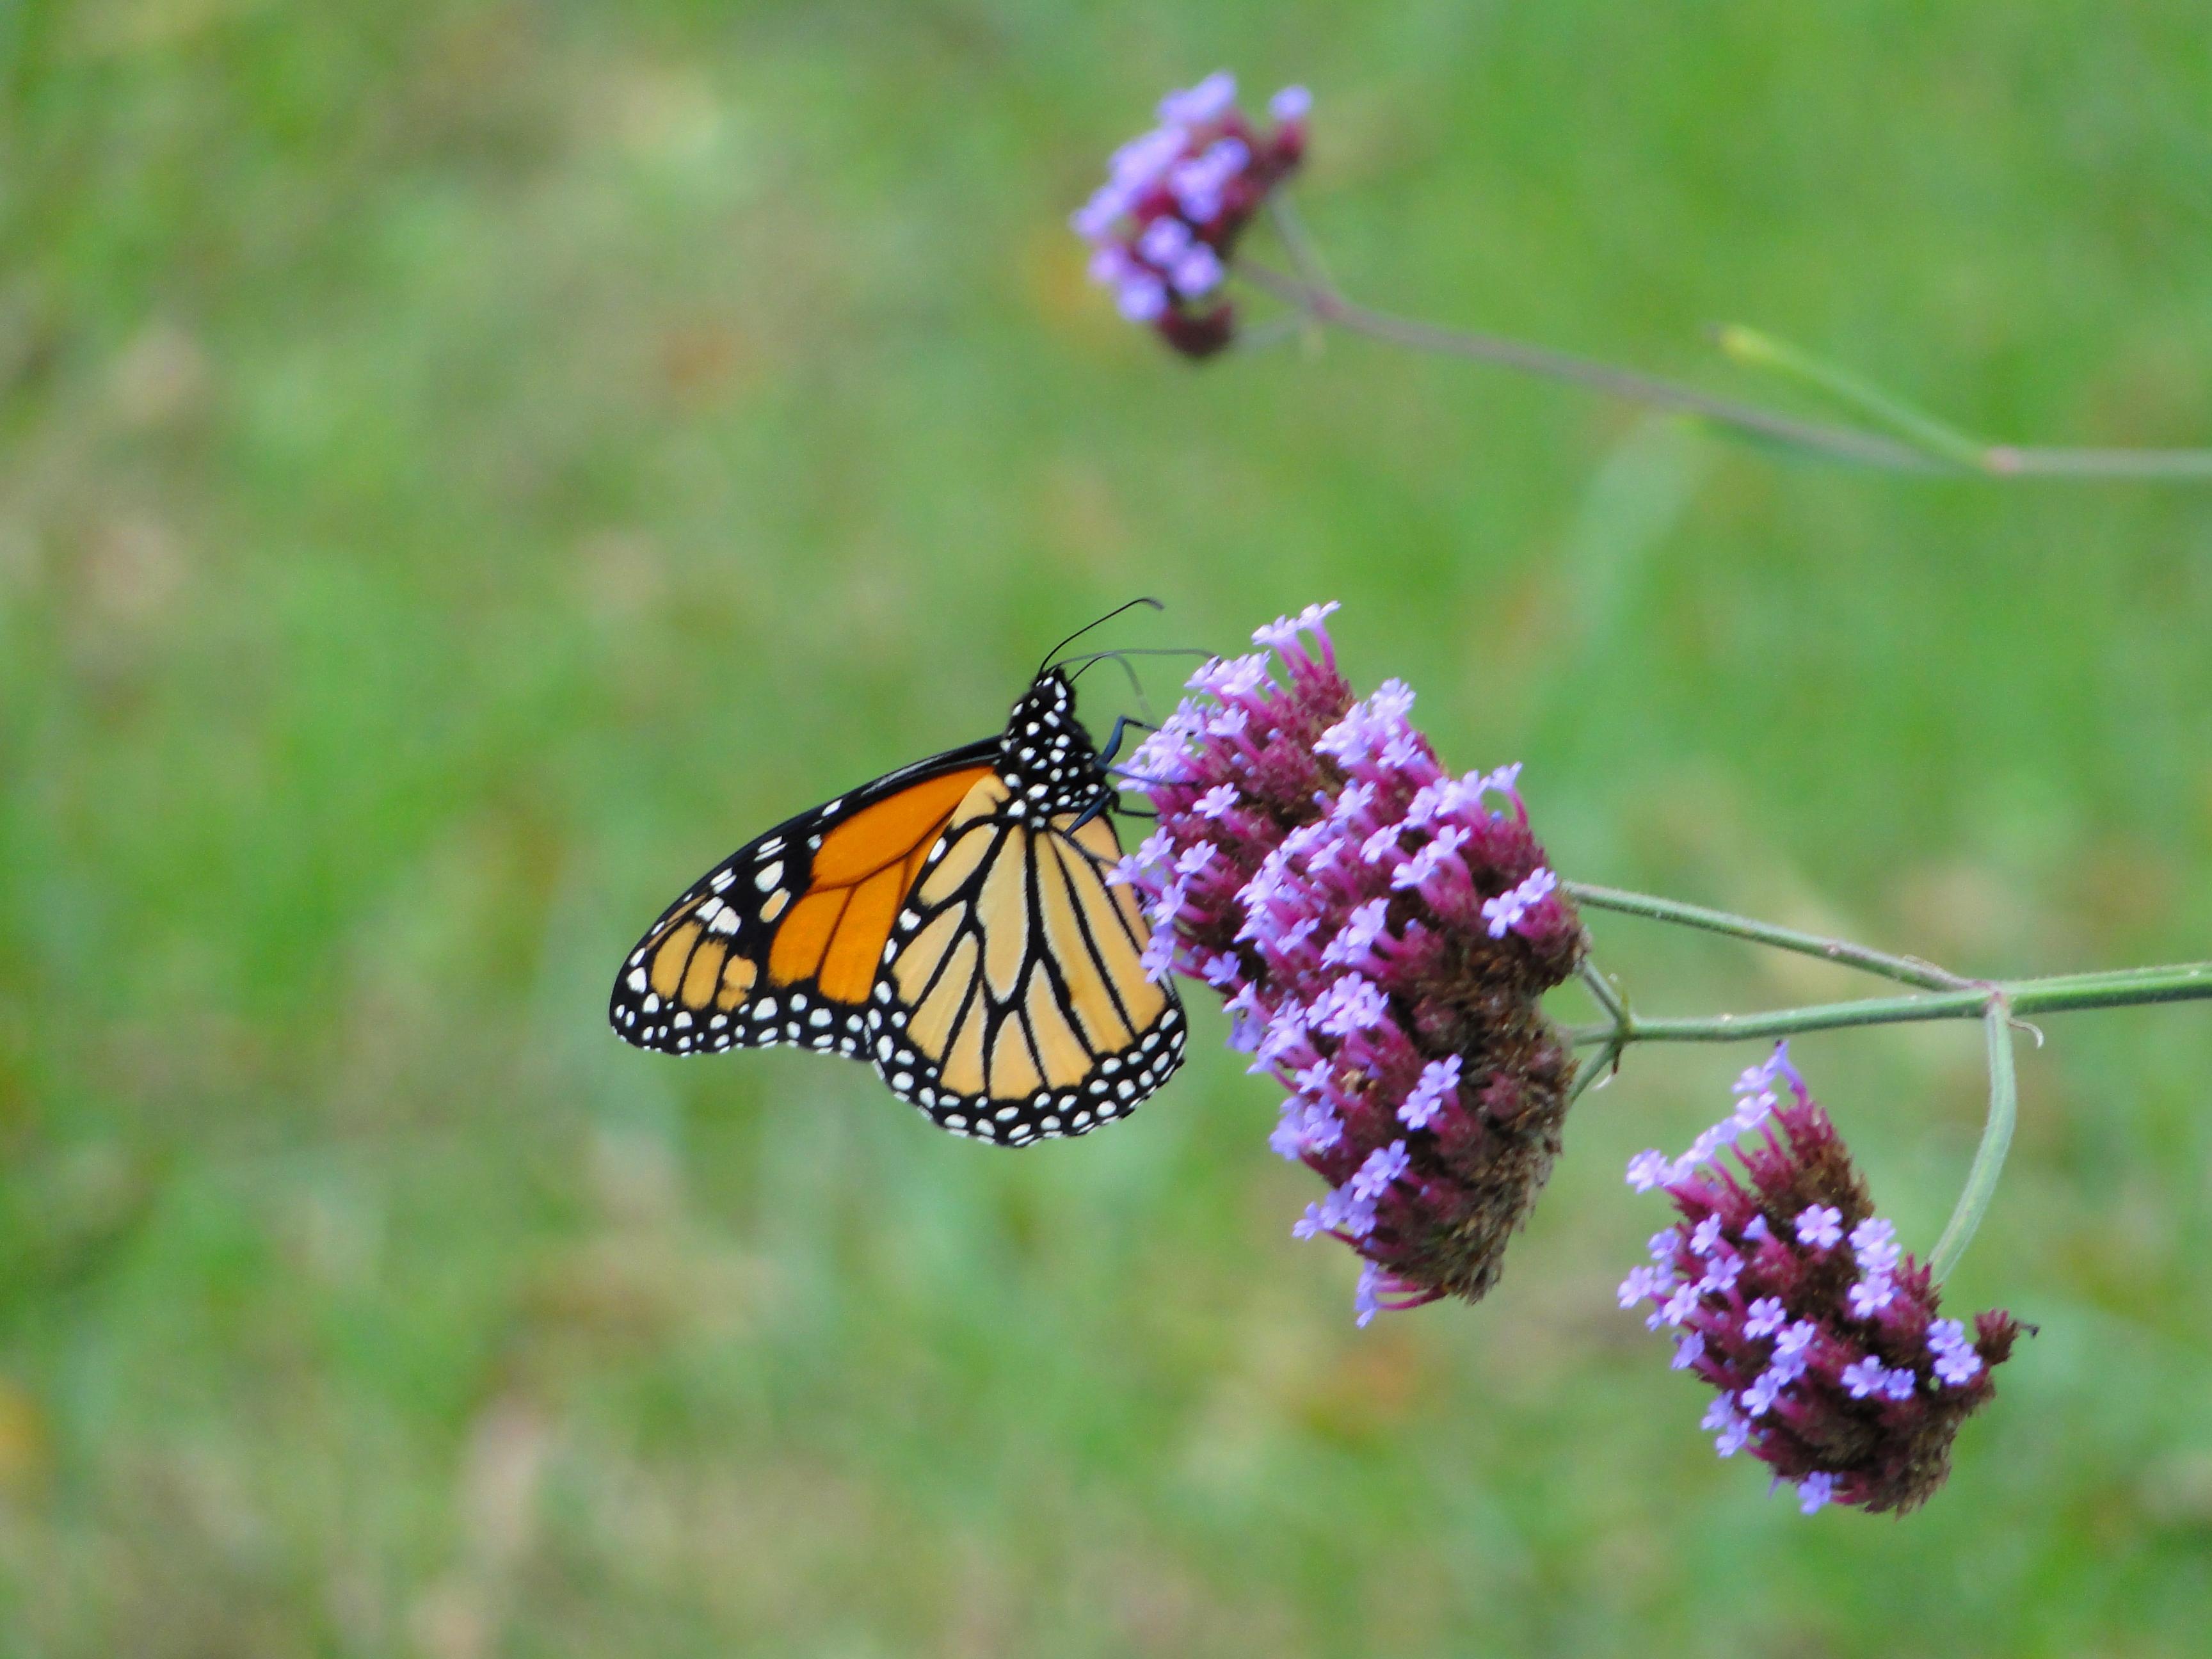 Dutchess County Butterfly on Flower. Stanfordville, NY